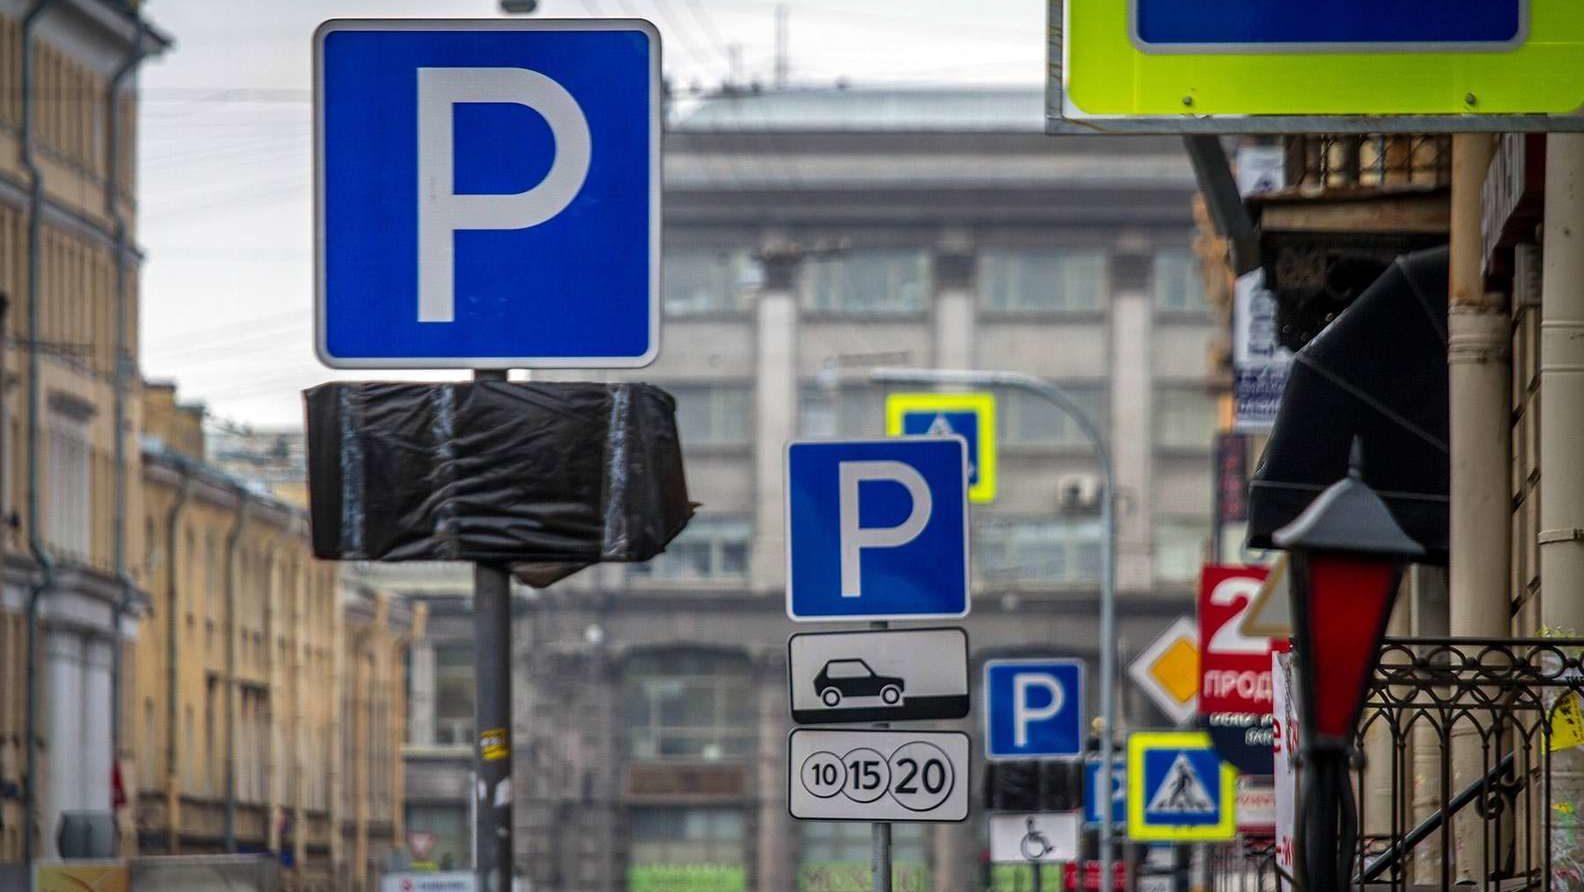 про парковку в столице